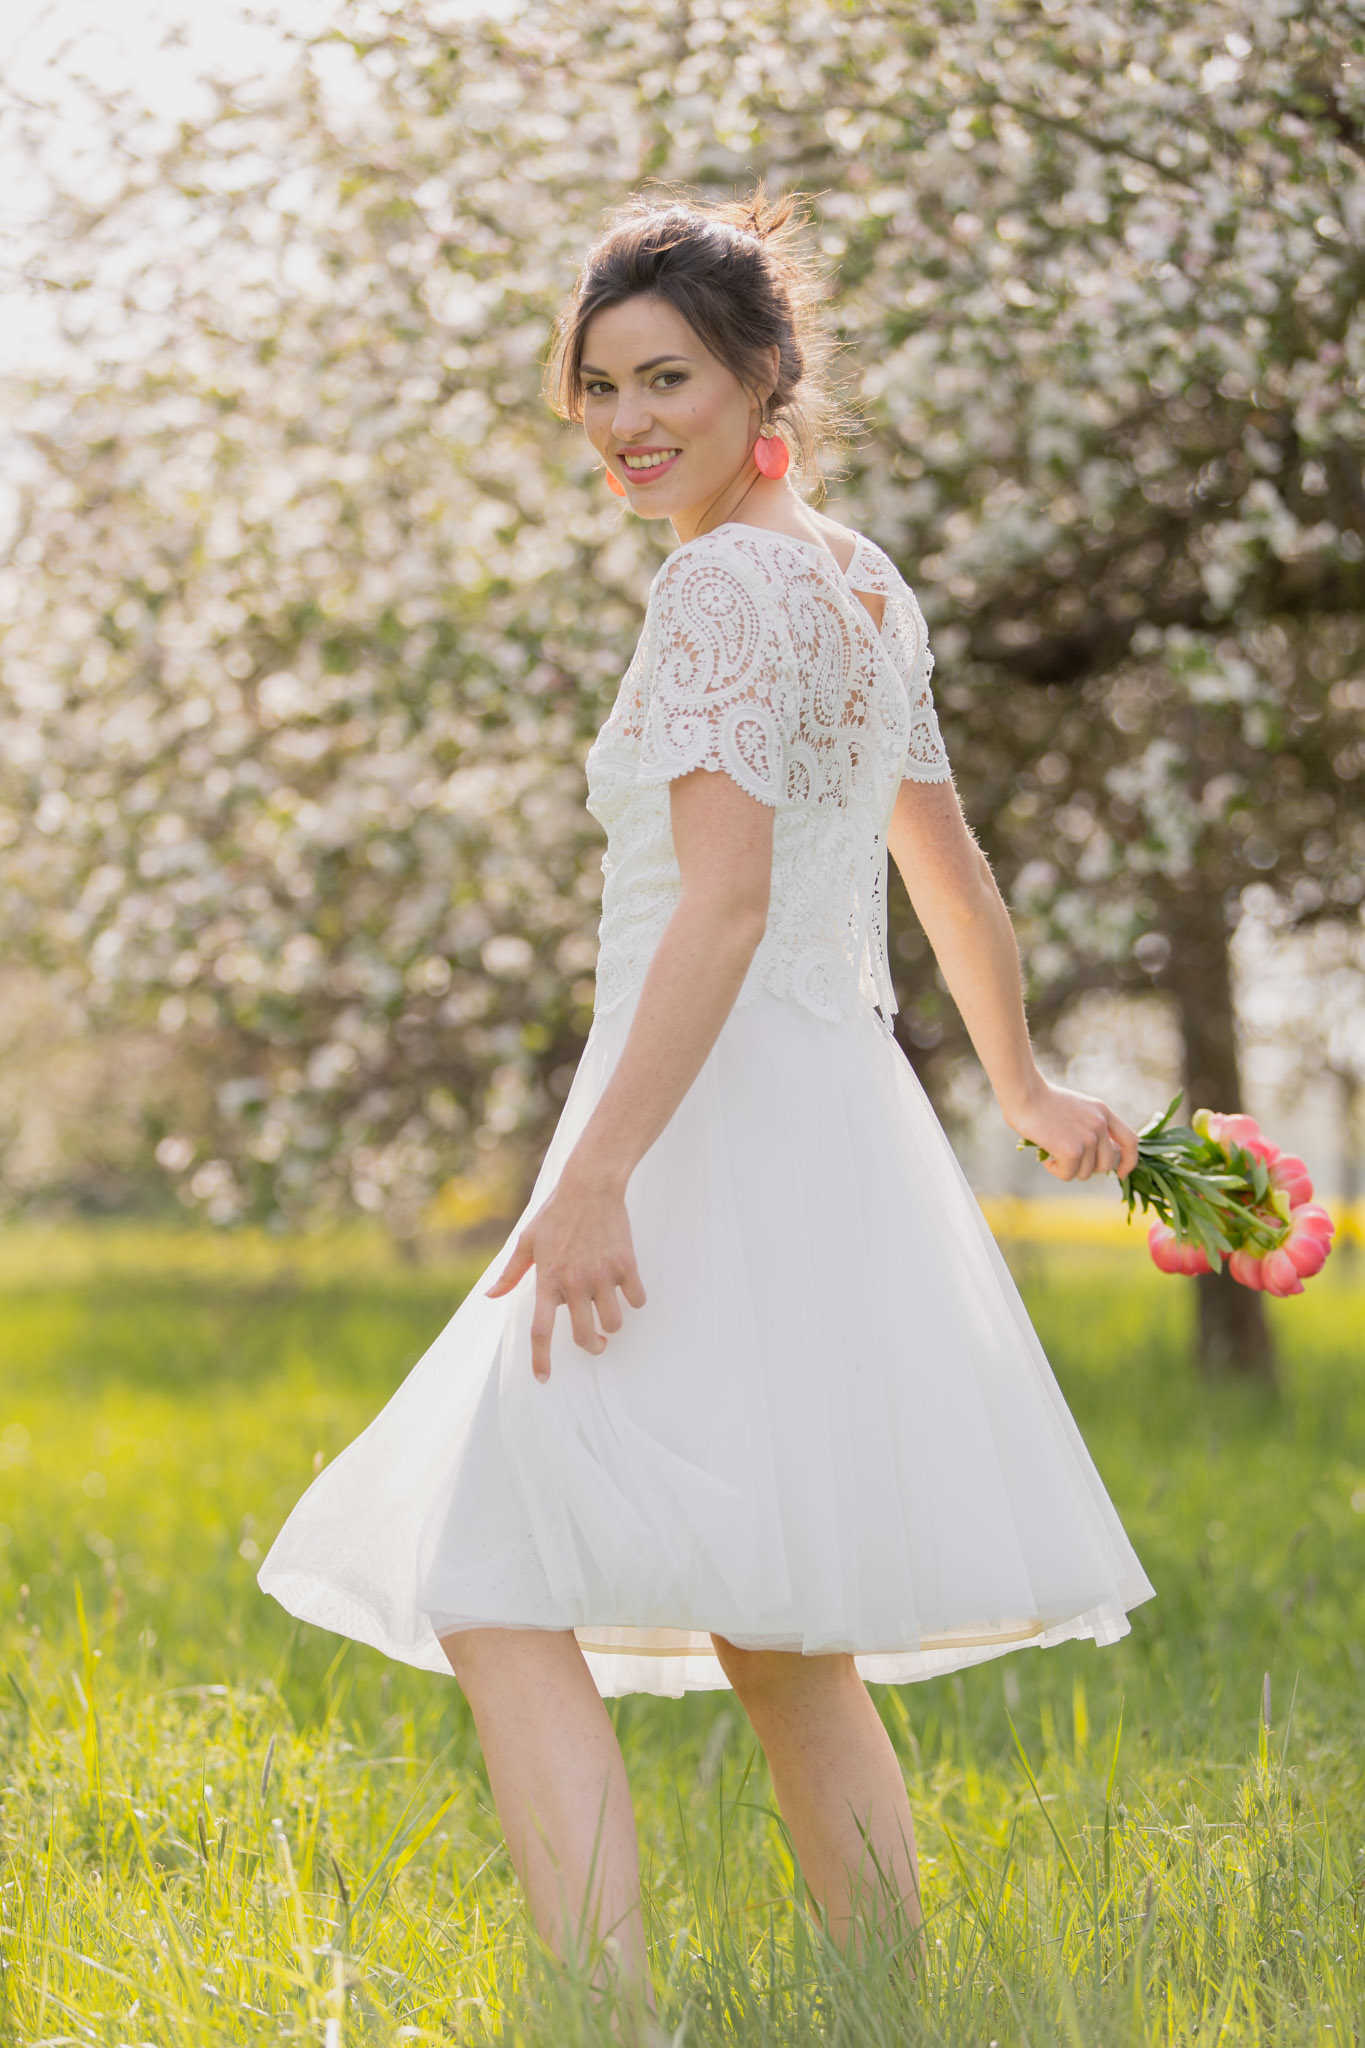 Kurzes Brautkleid Zahra: Rückenfrei mit modernem Top